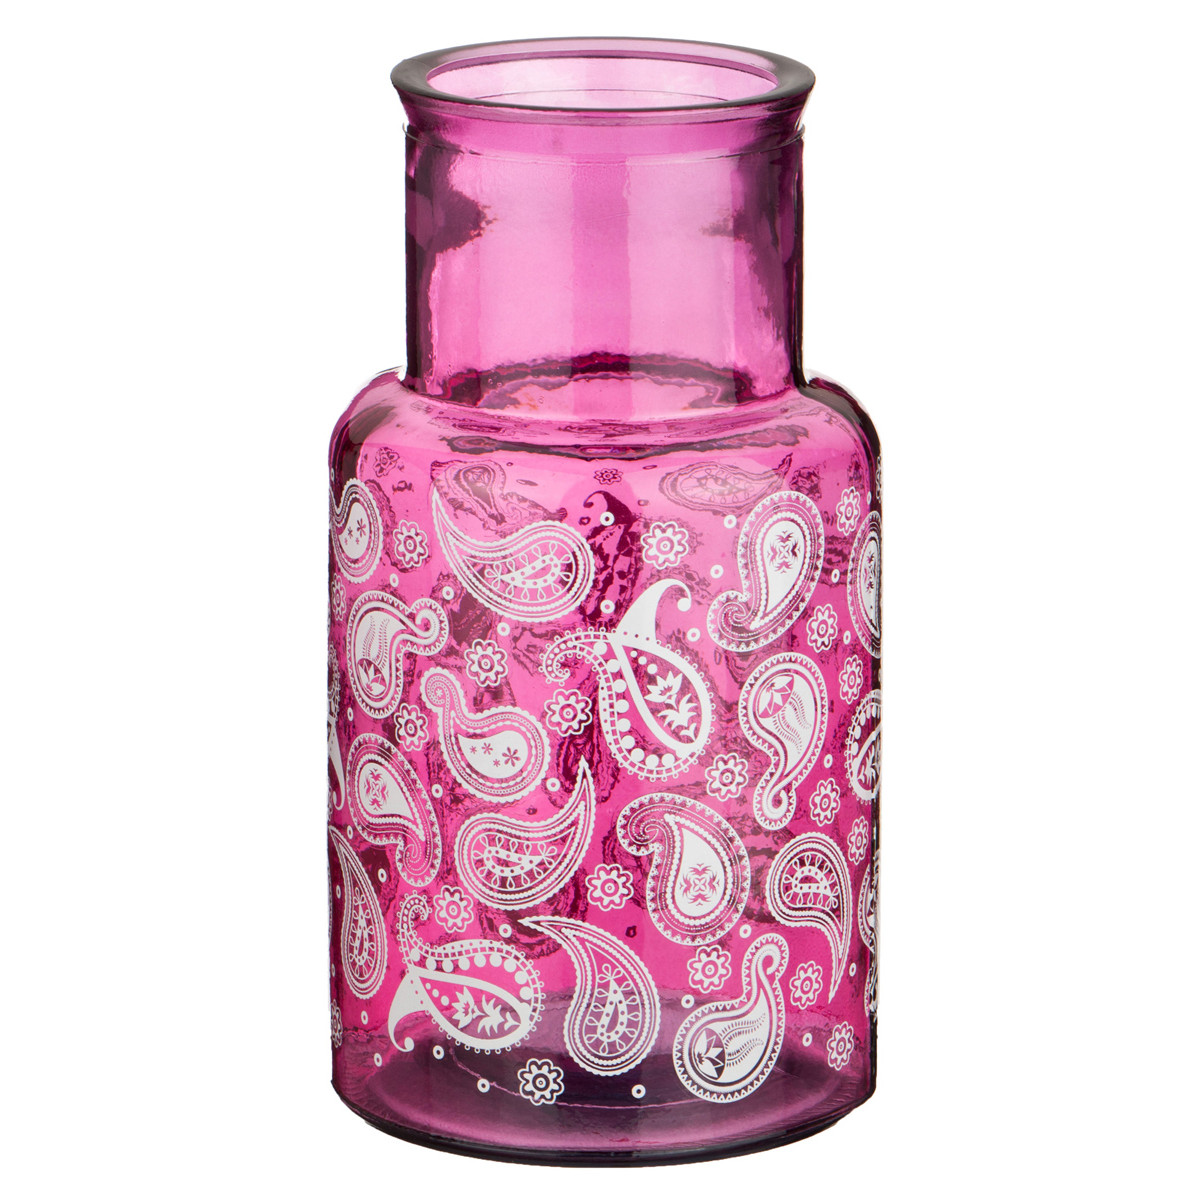 {} San Miguel Ваза Gabriela  (28 см) san miguel ваза hortense 16 см